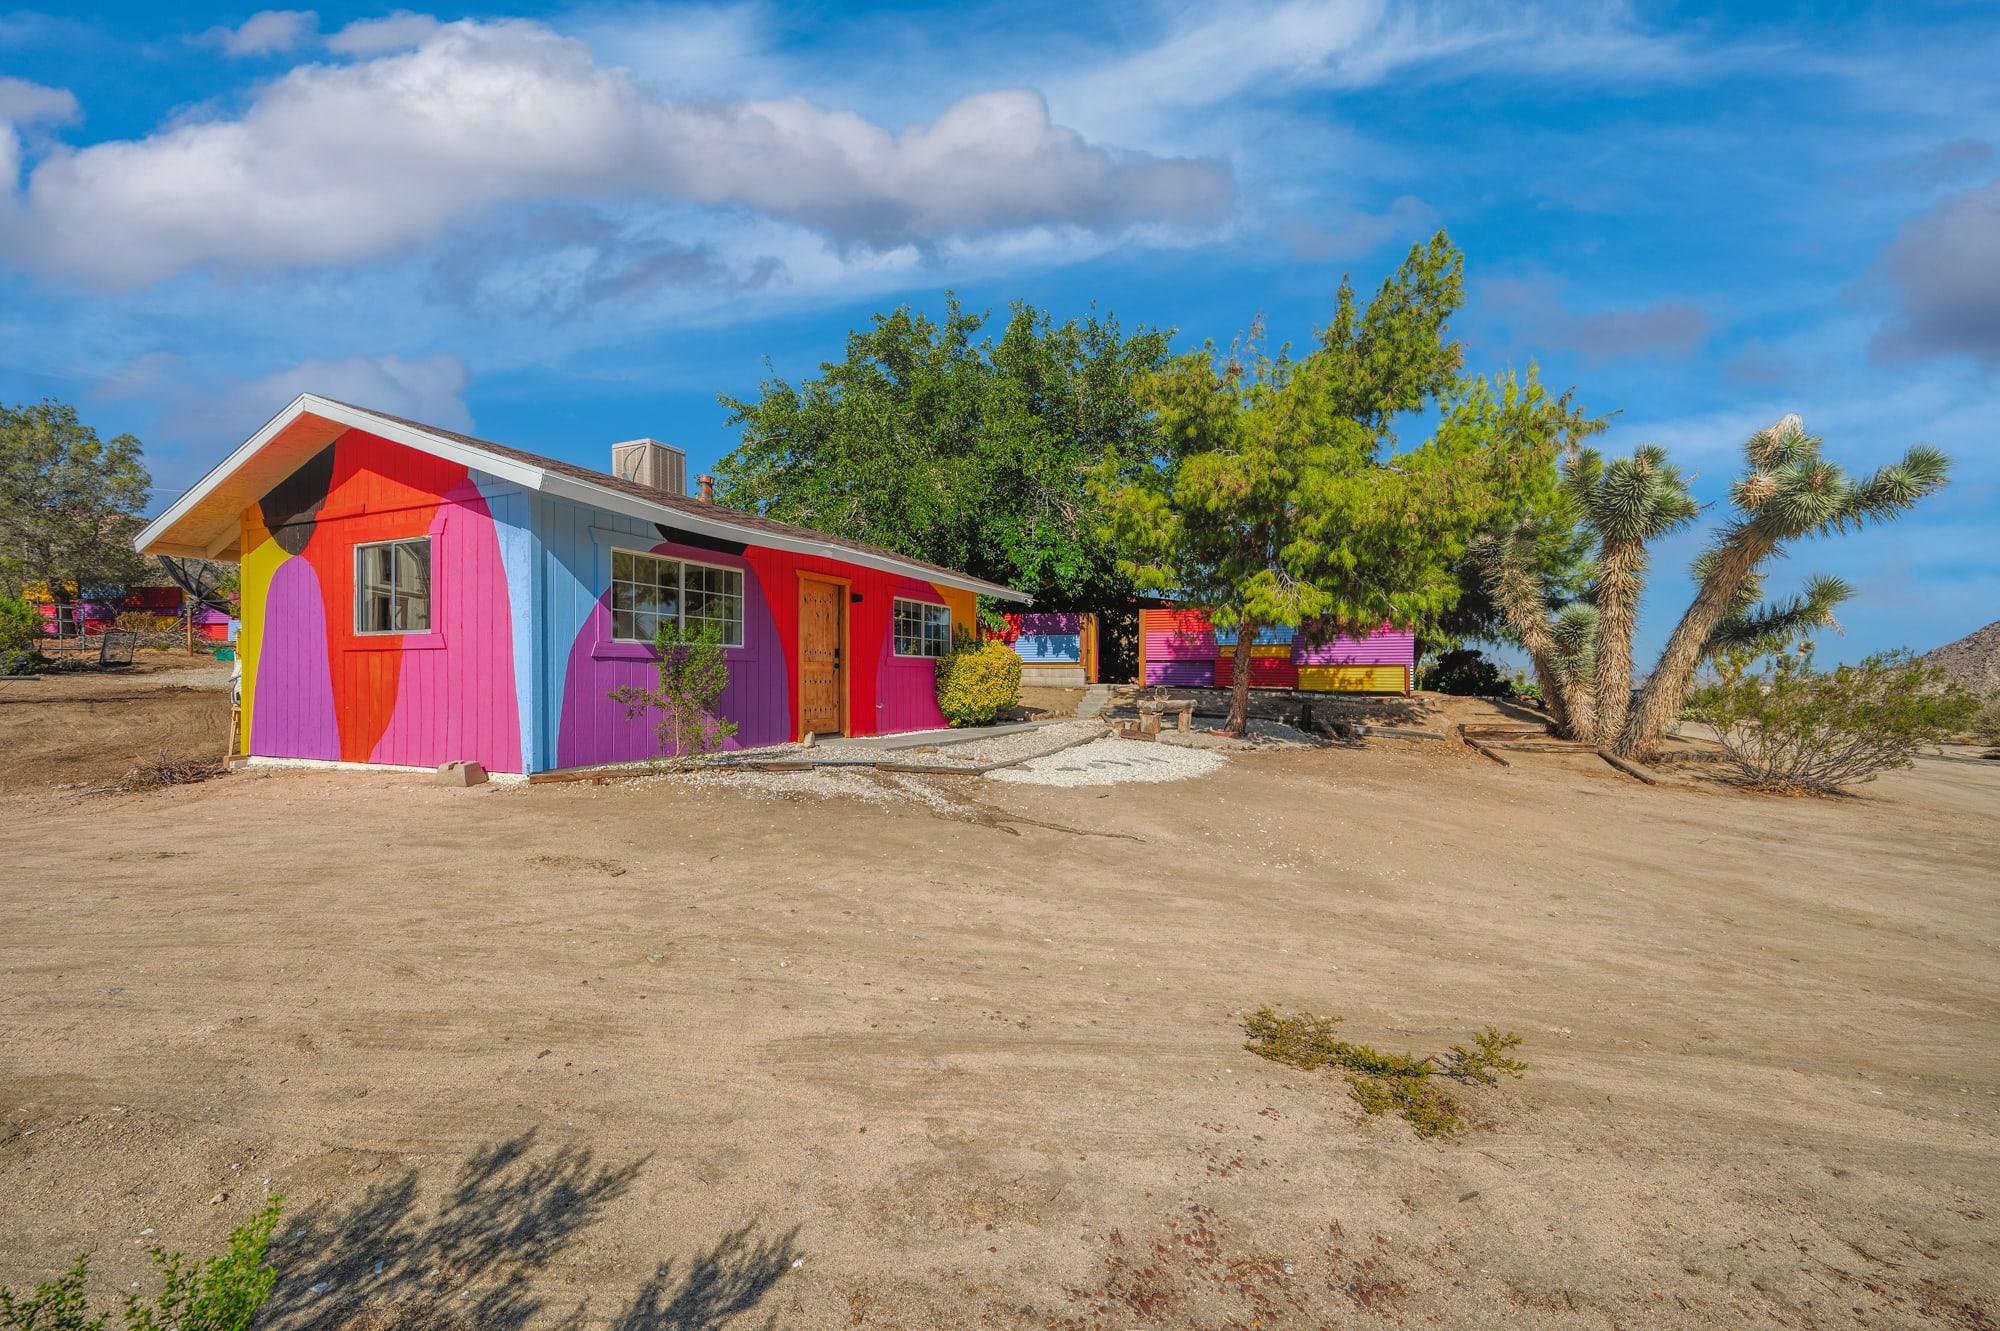 @ Marbella Lane - Rainbow House | Glampers Paradise